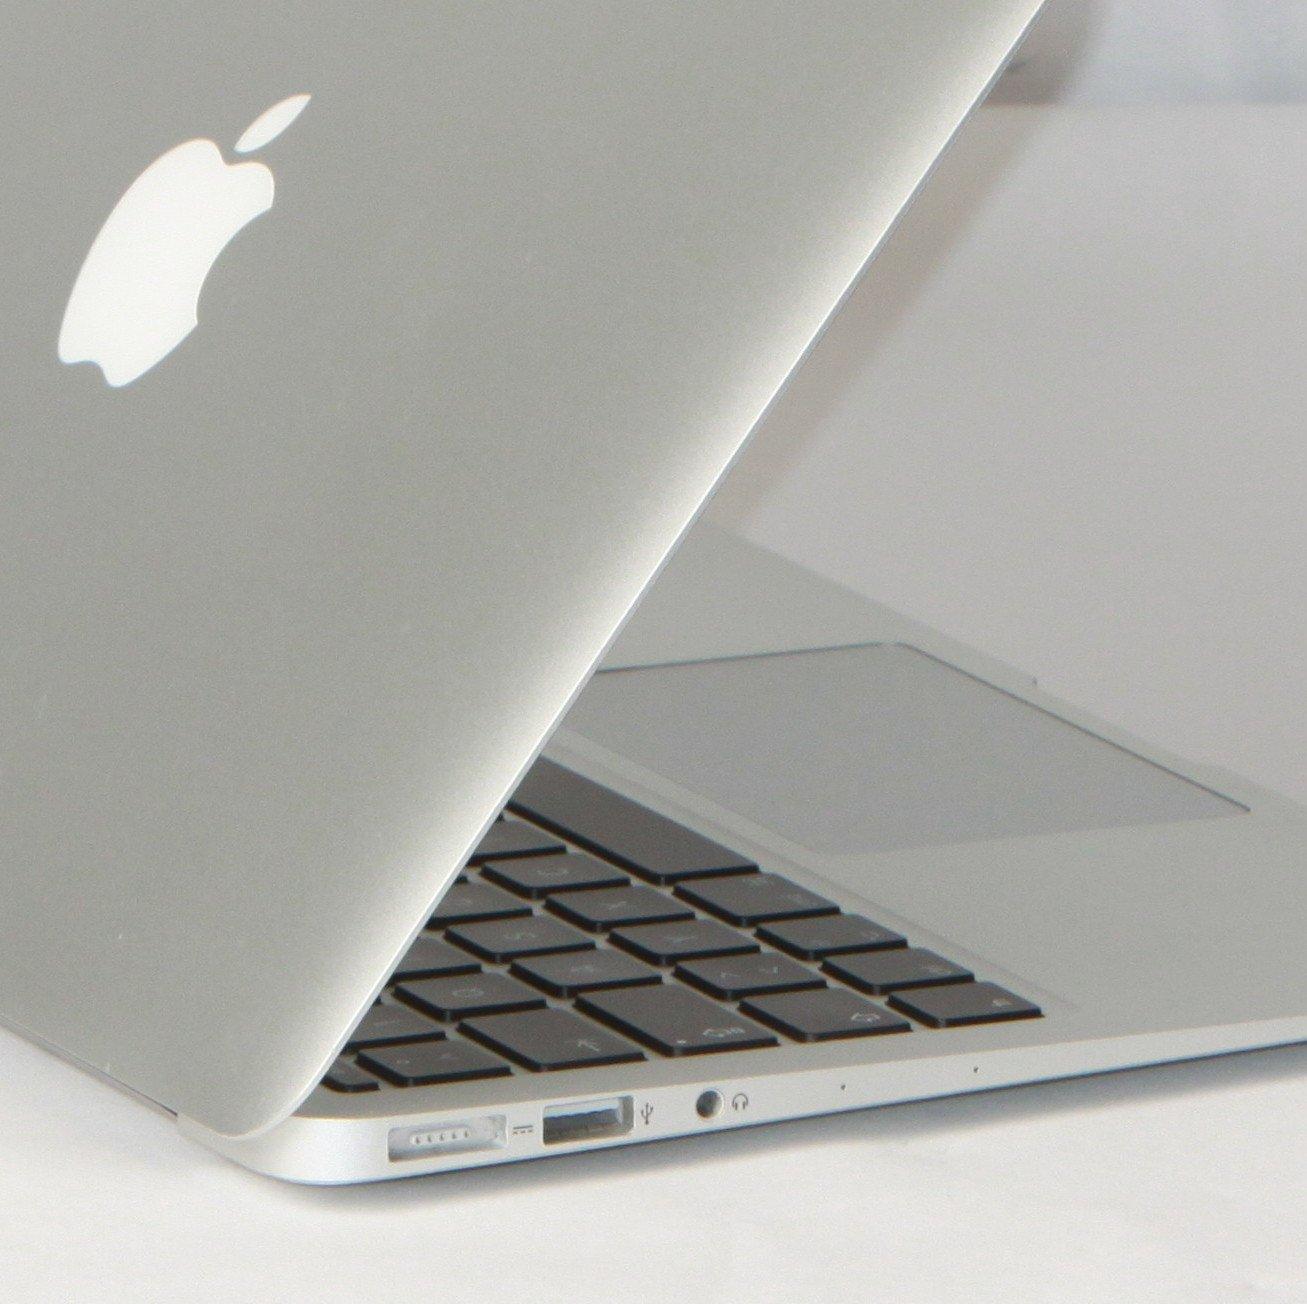 apple macbook air a1465 md711da io sadaghian it speicherlosungen und apple mac reparaturen in. Black Bedroom Furniture Sets. Home Design Ideas